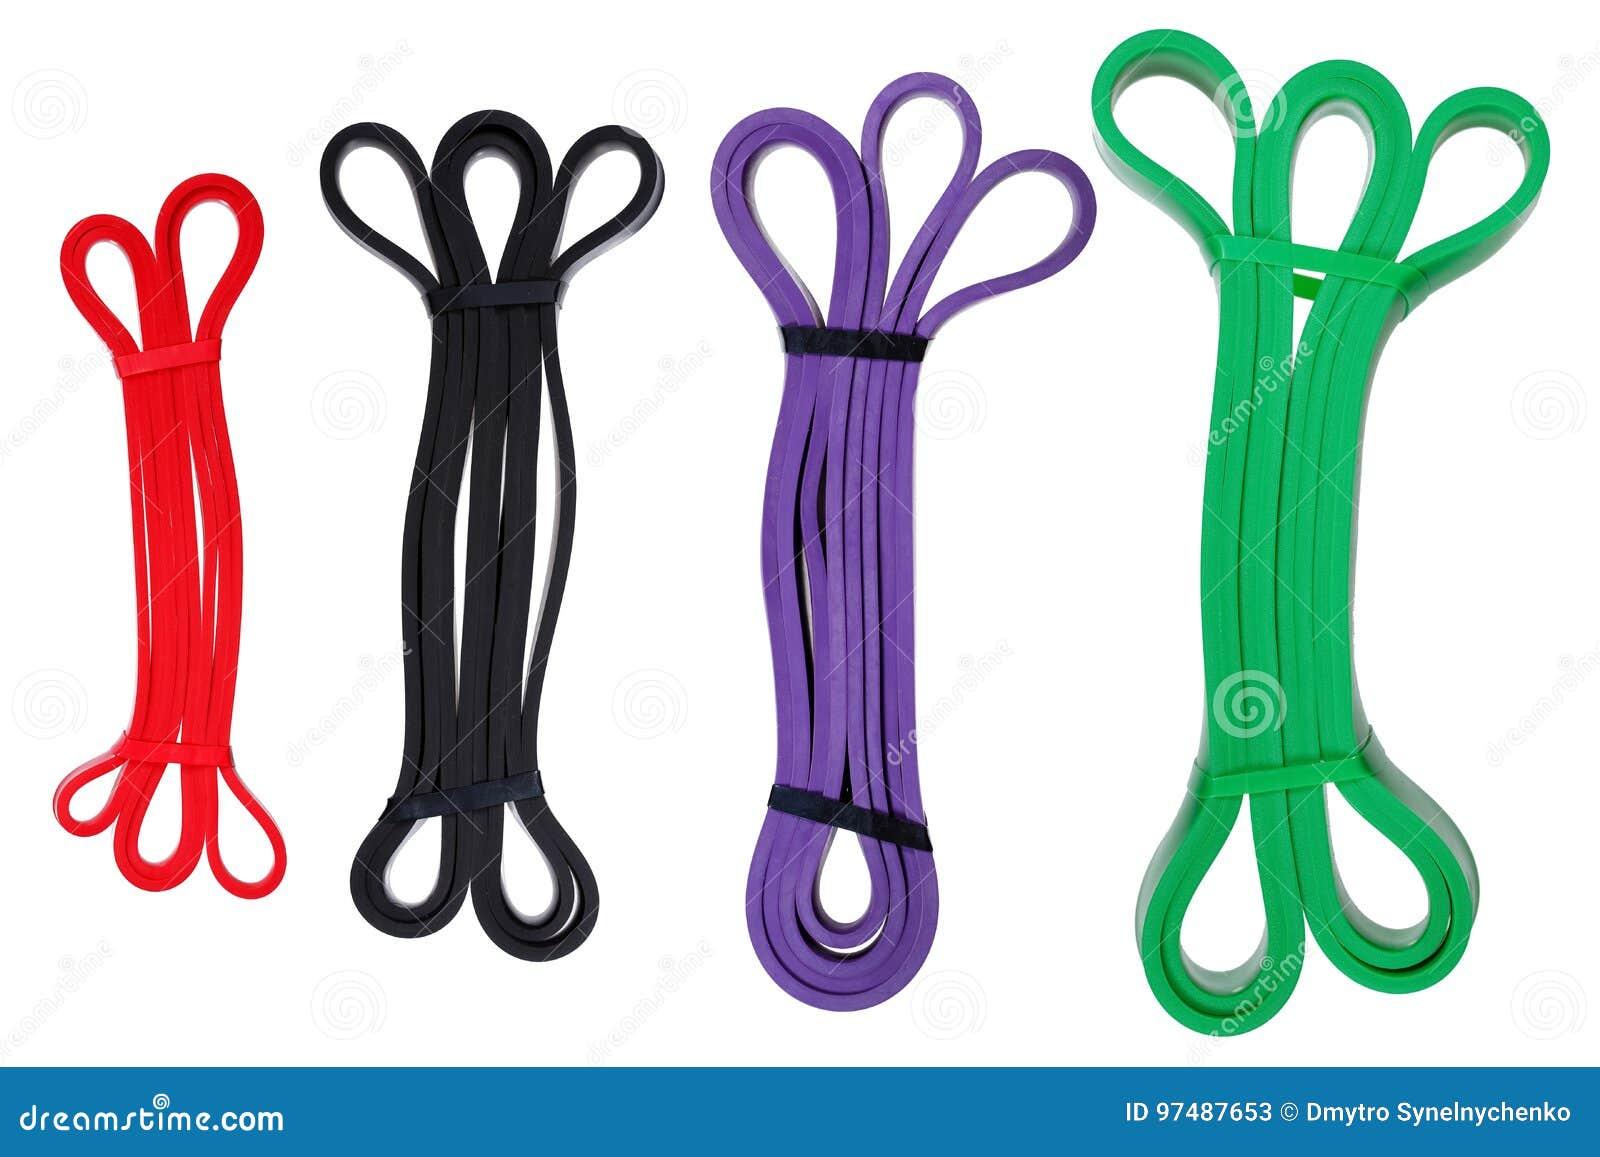 Insieme degli elastici torti per terapia fisica di forma fisica